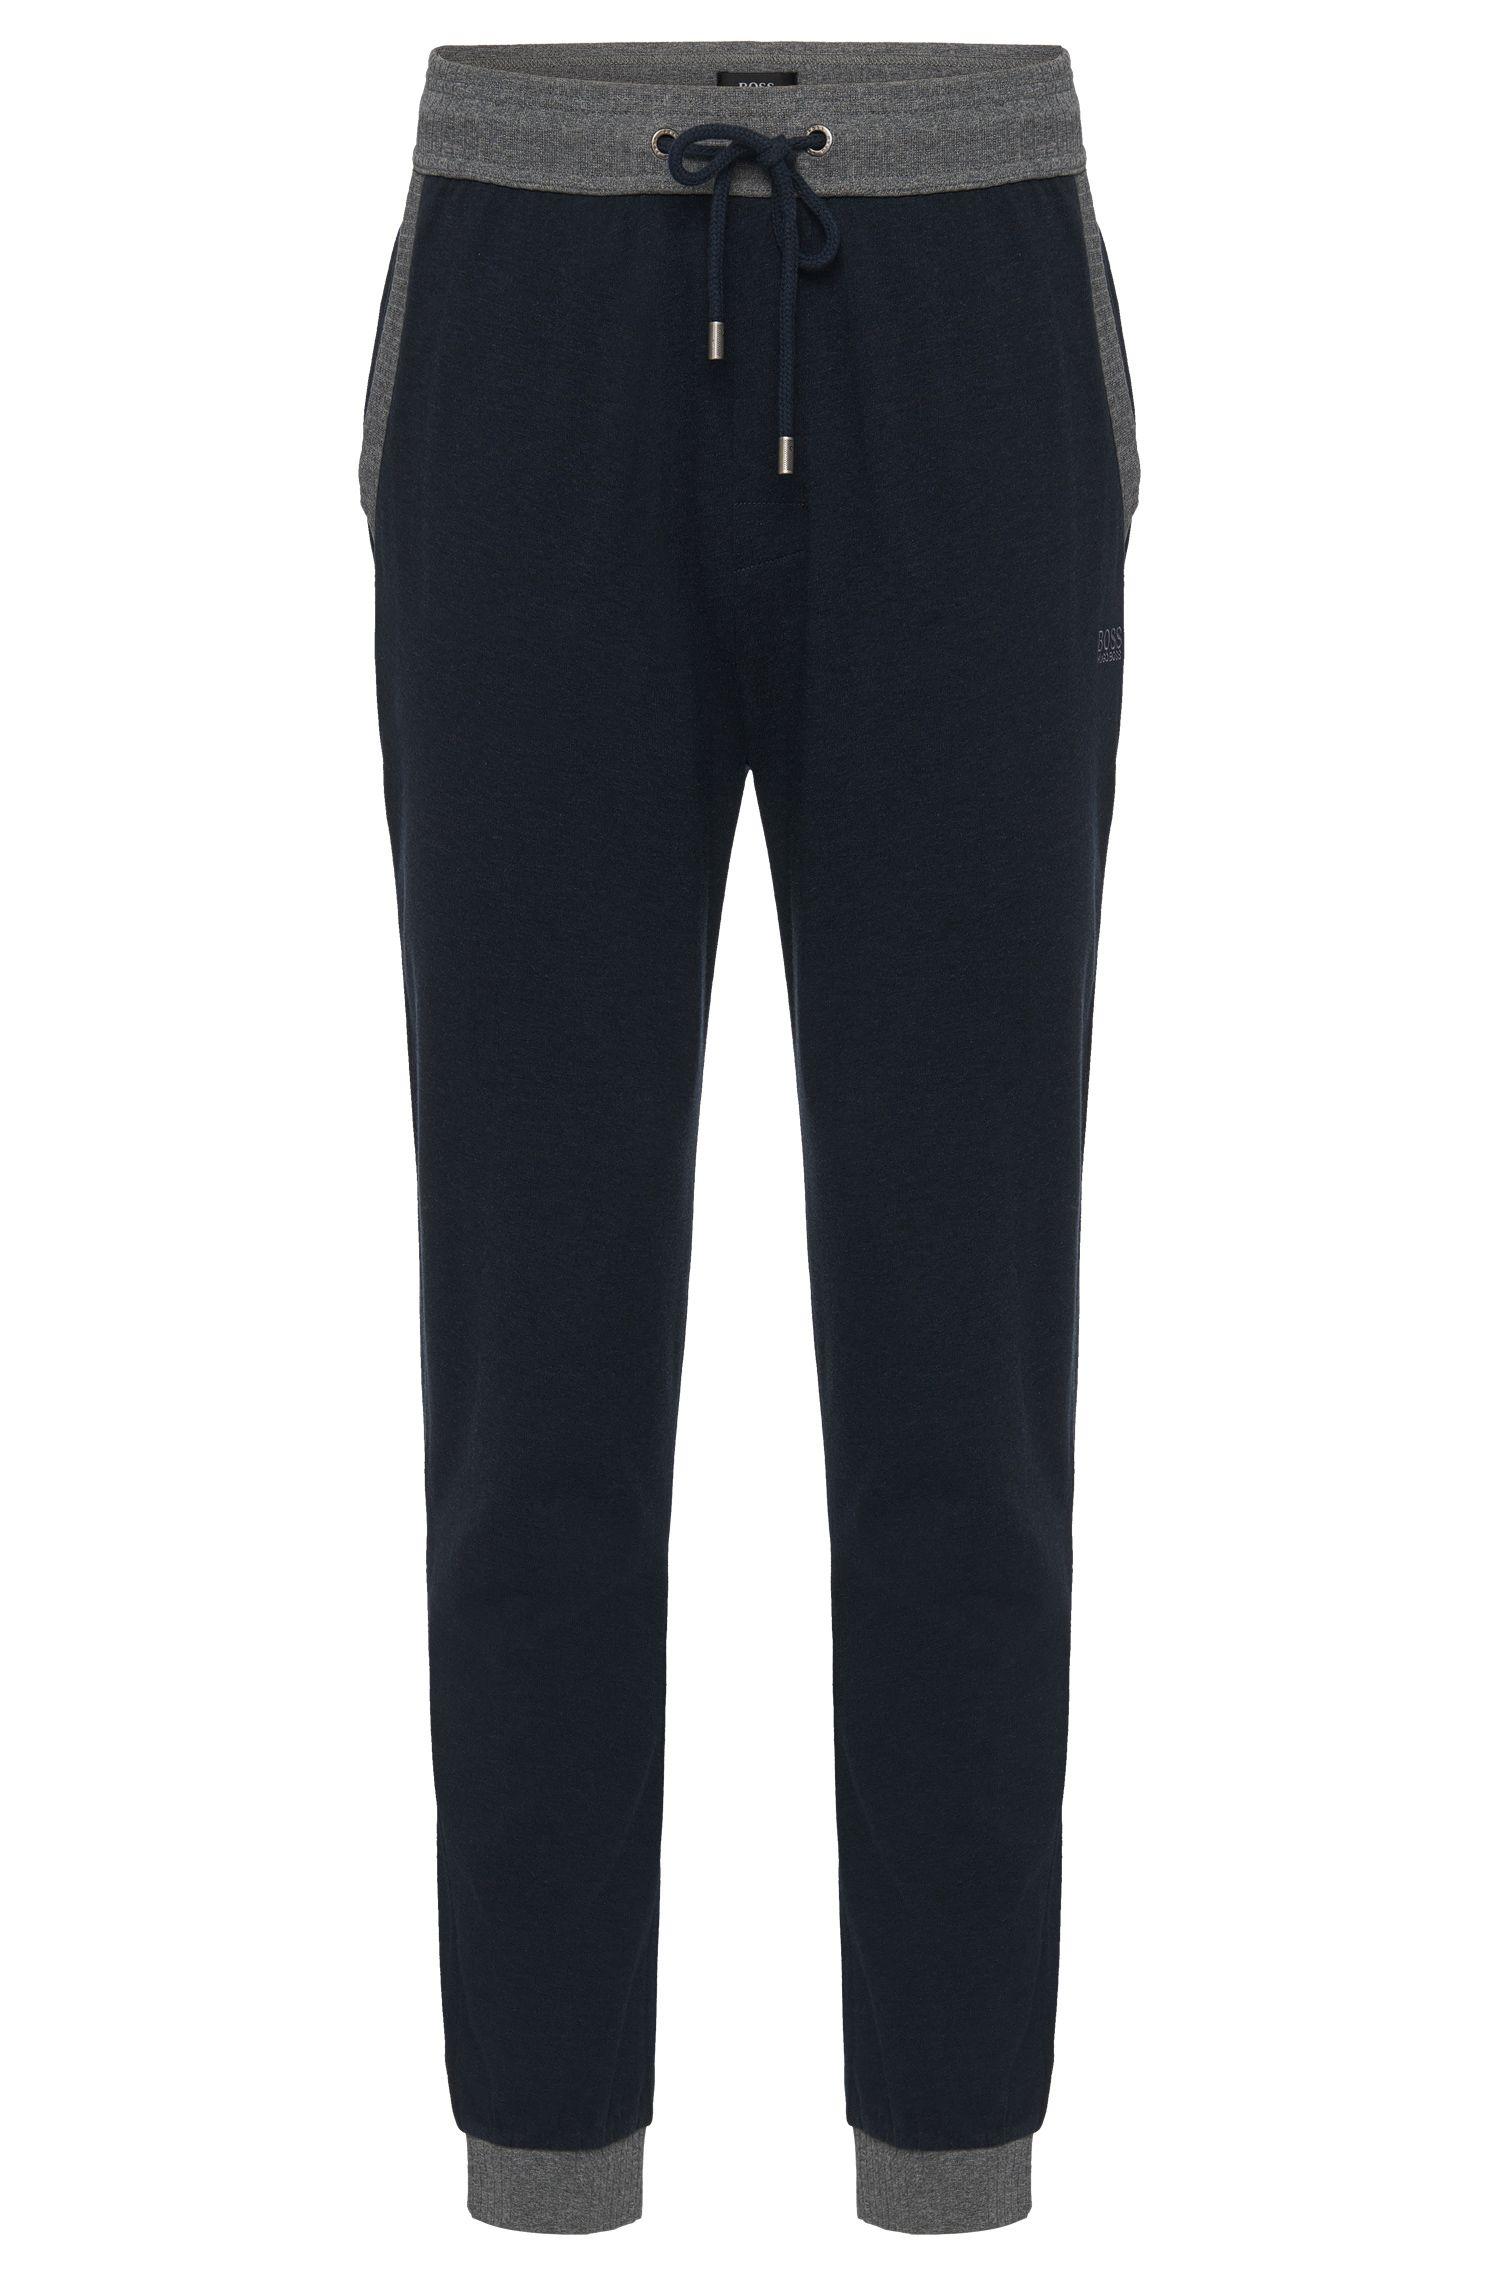 'Long Pant Cuffs' | Cotton Drawstring Sweat Pants